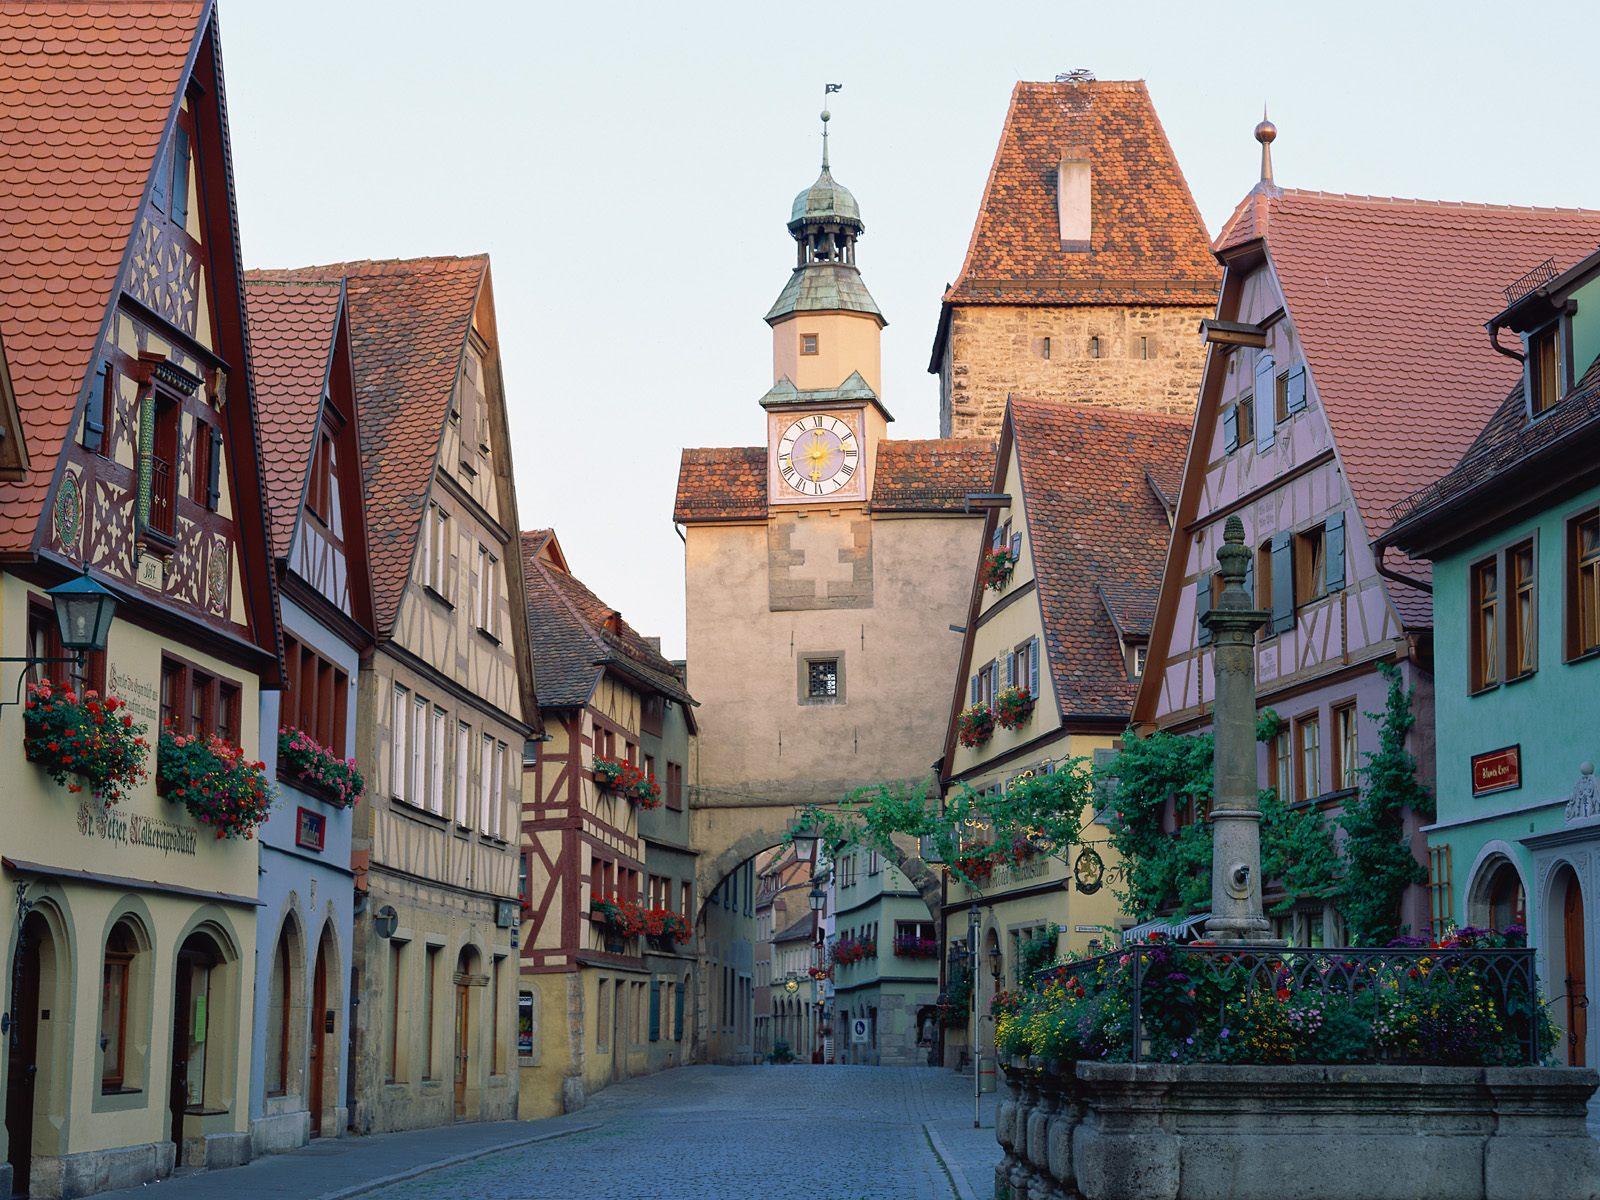 Rothenburg_ob_der_Tauber_Bavaria_Germany